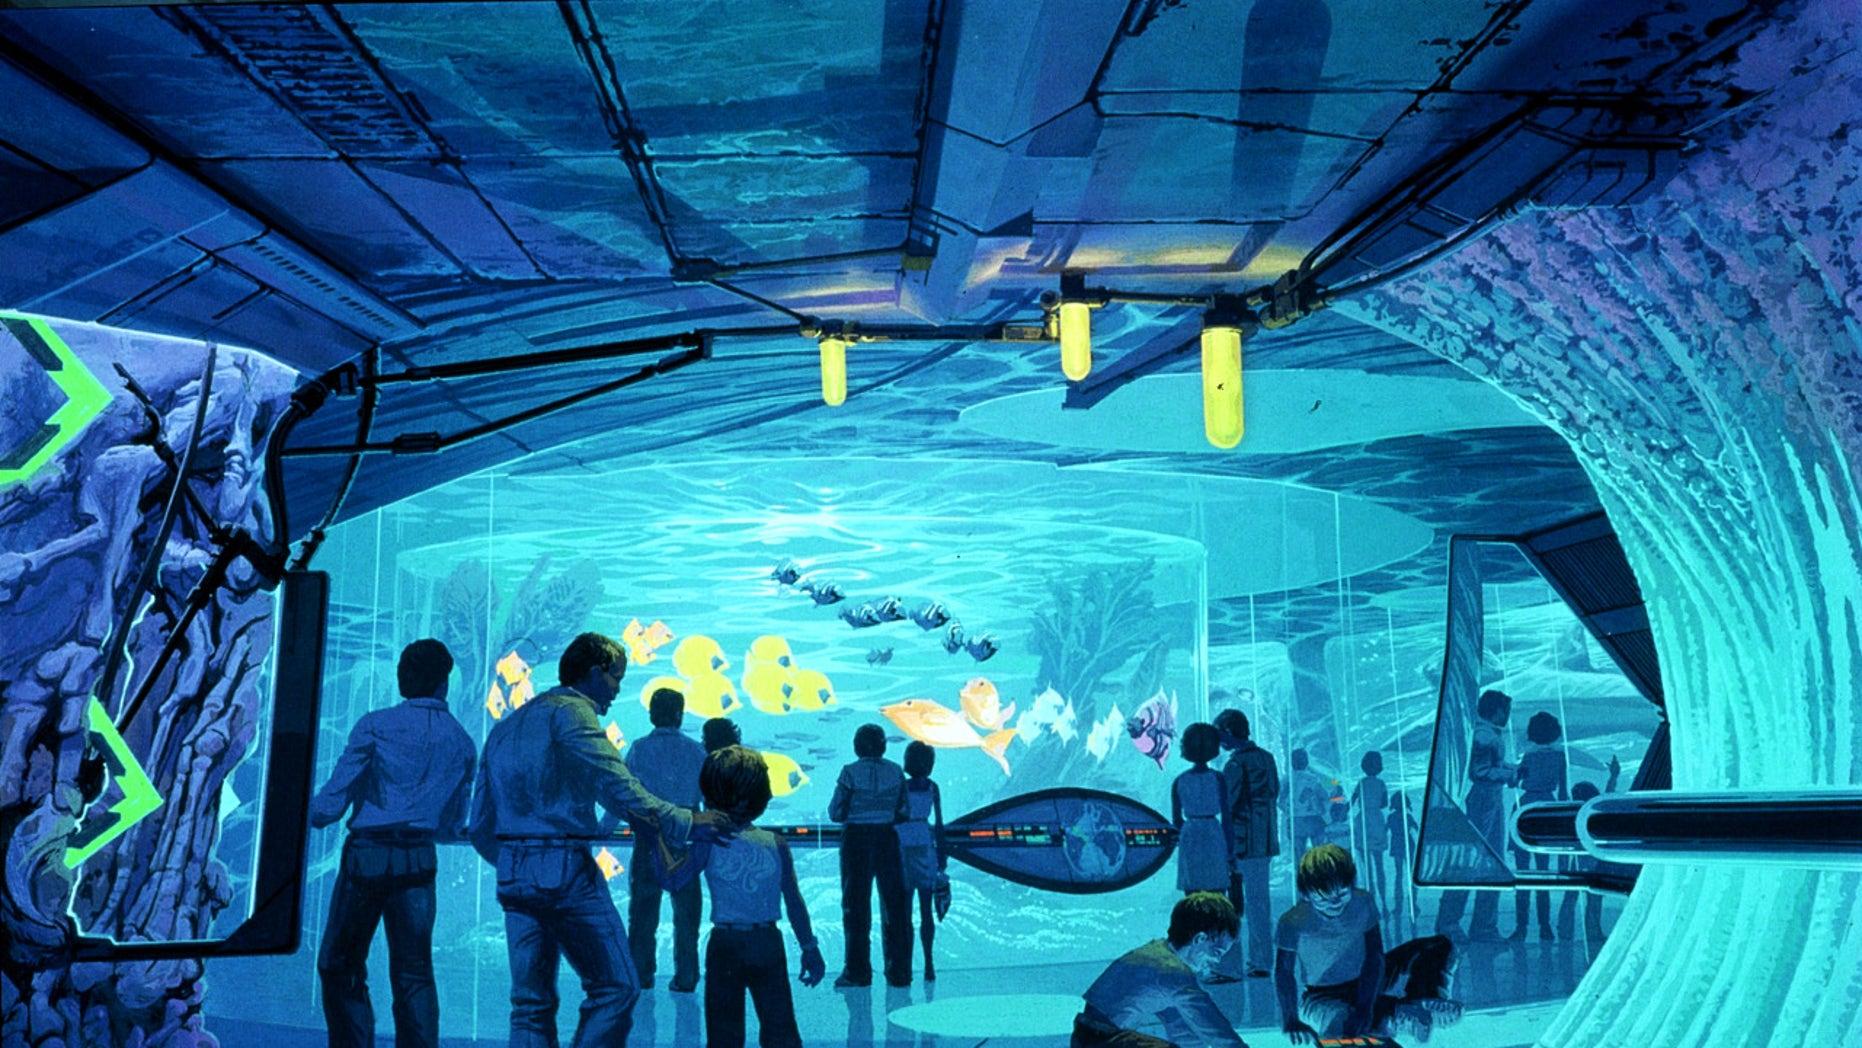 A peek inside the virtual aquatic center.